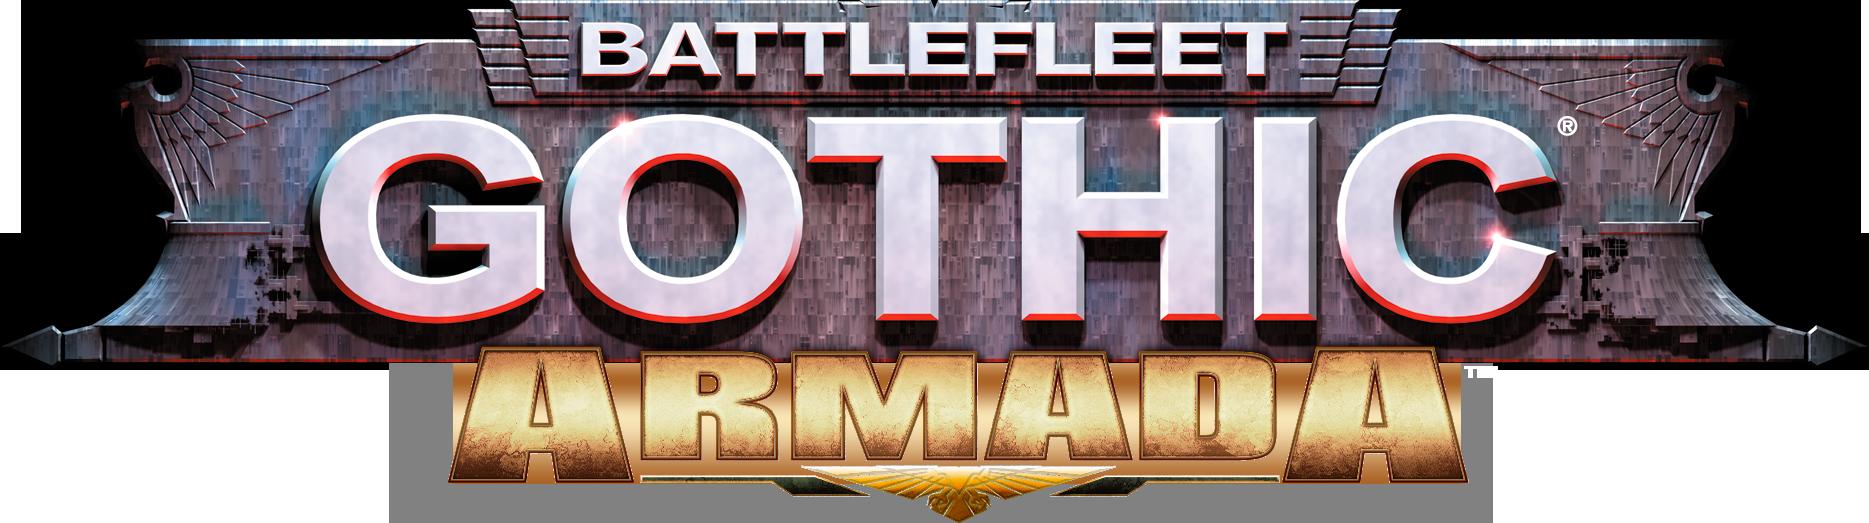 battlefleet_gothic_armada-logo